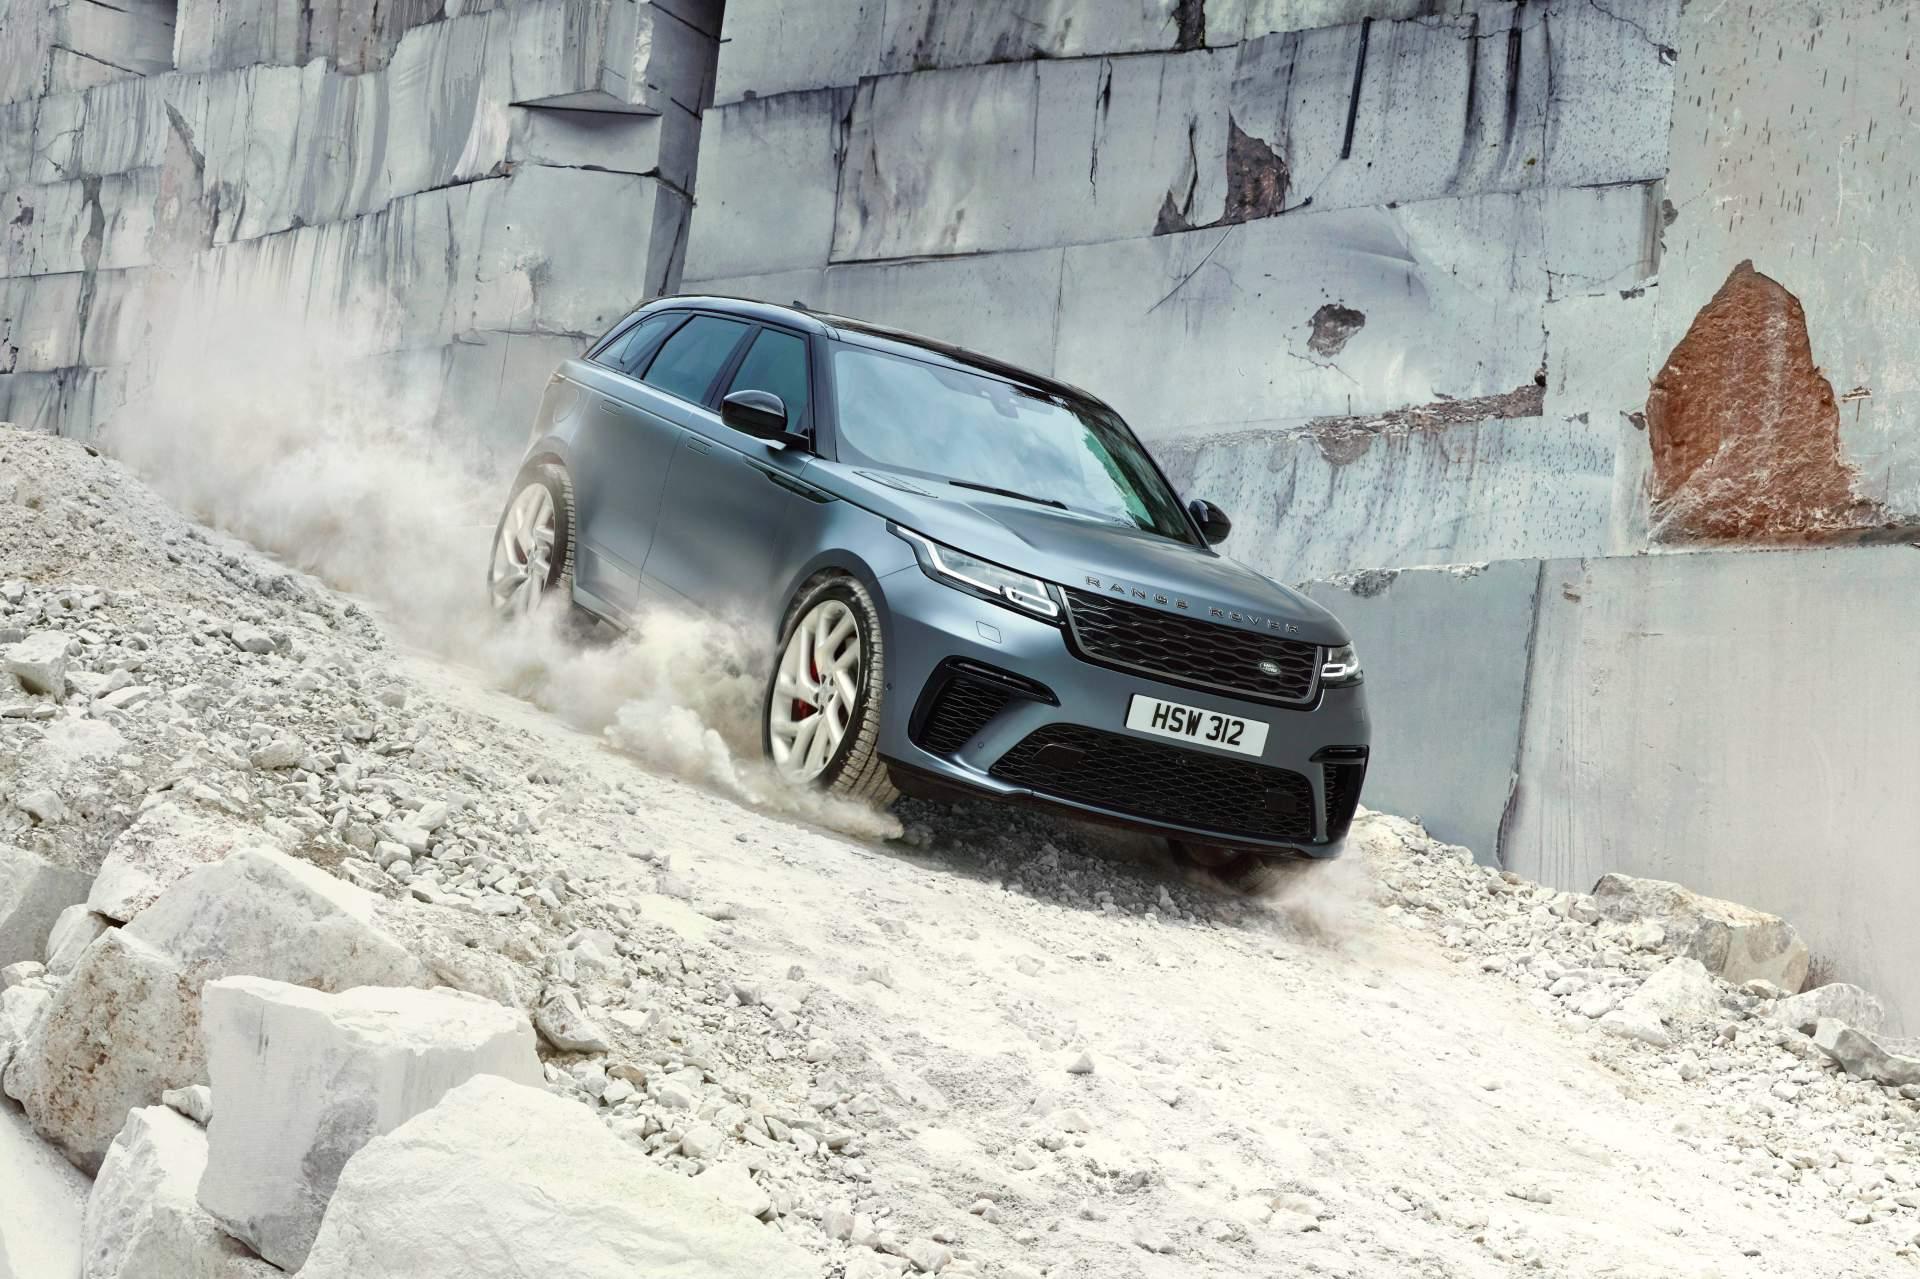 2019 Range Rover Velar SVAutobiography Dynamic Edition Front Three-Quarter Wallpapers (10)